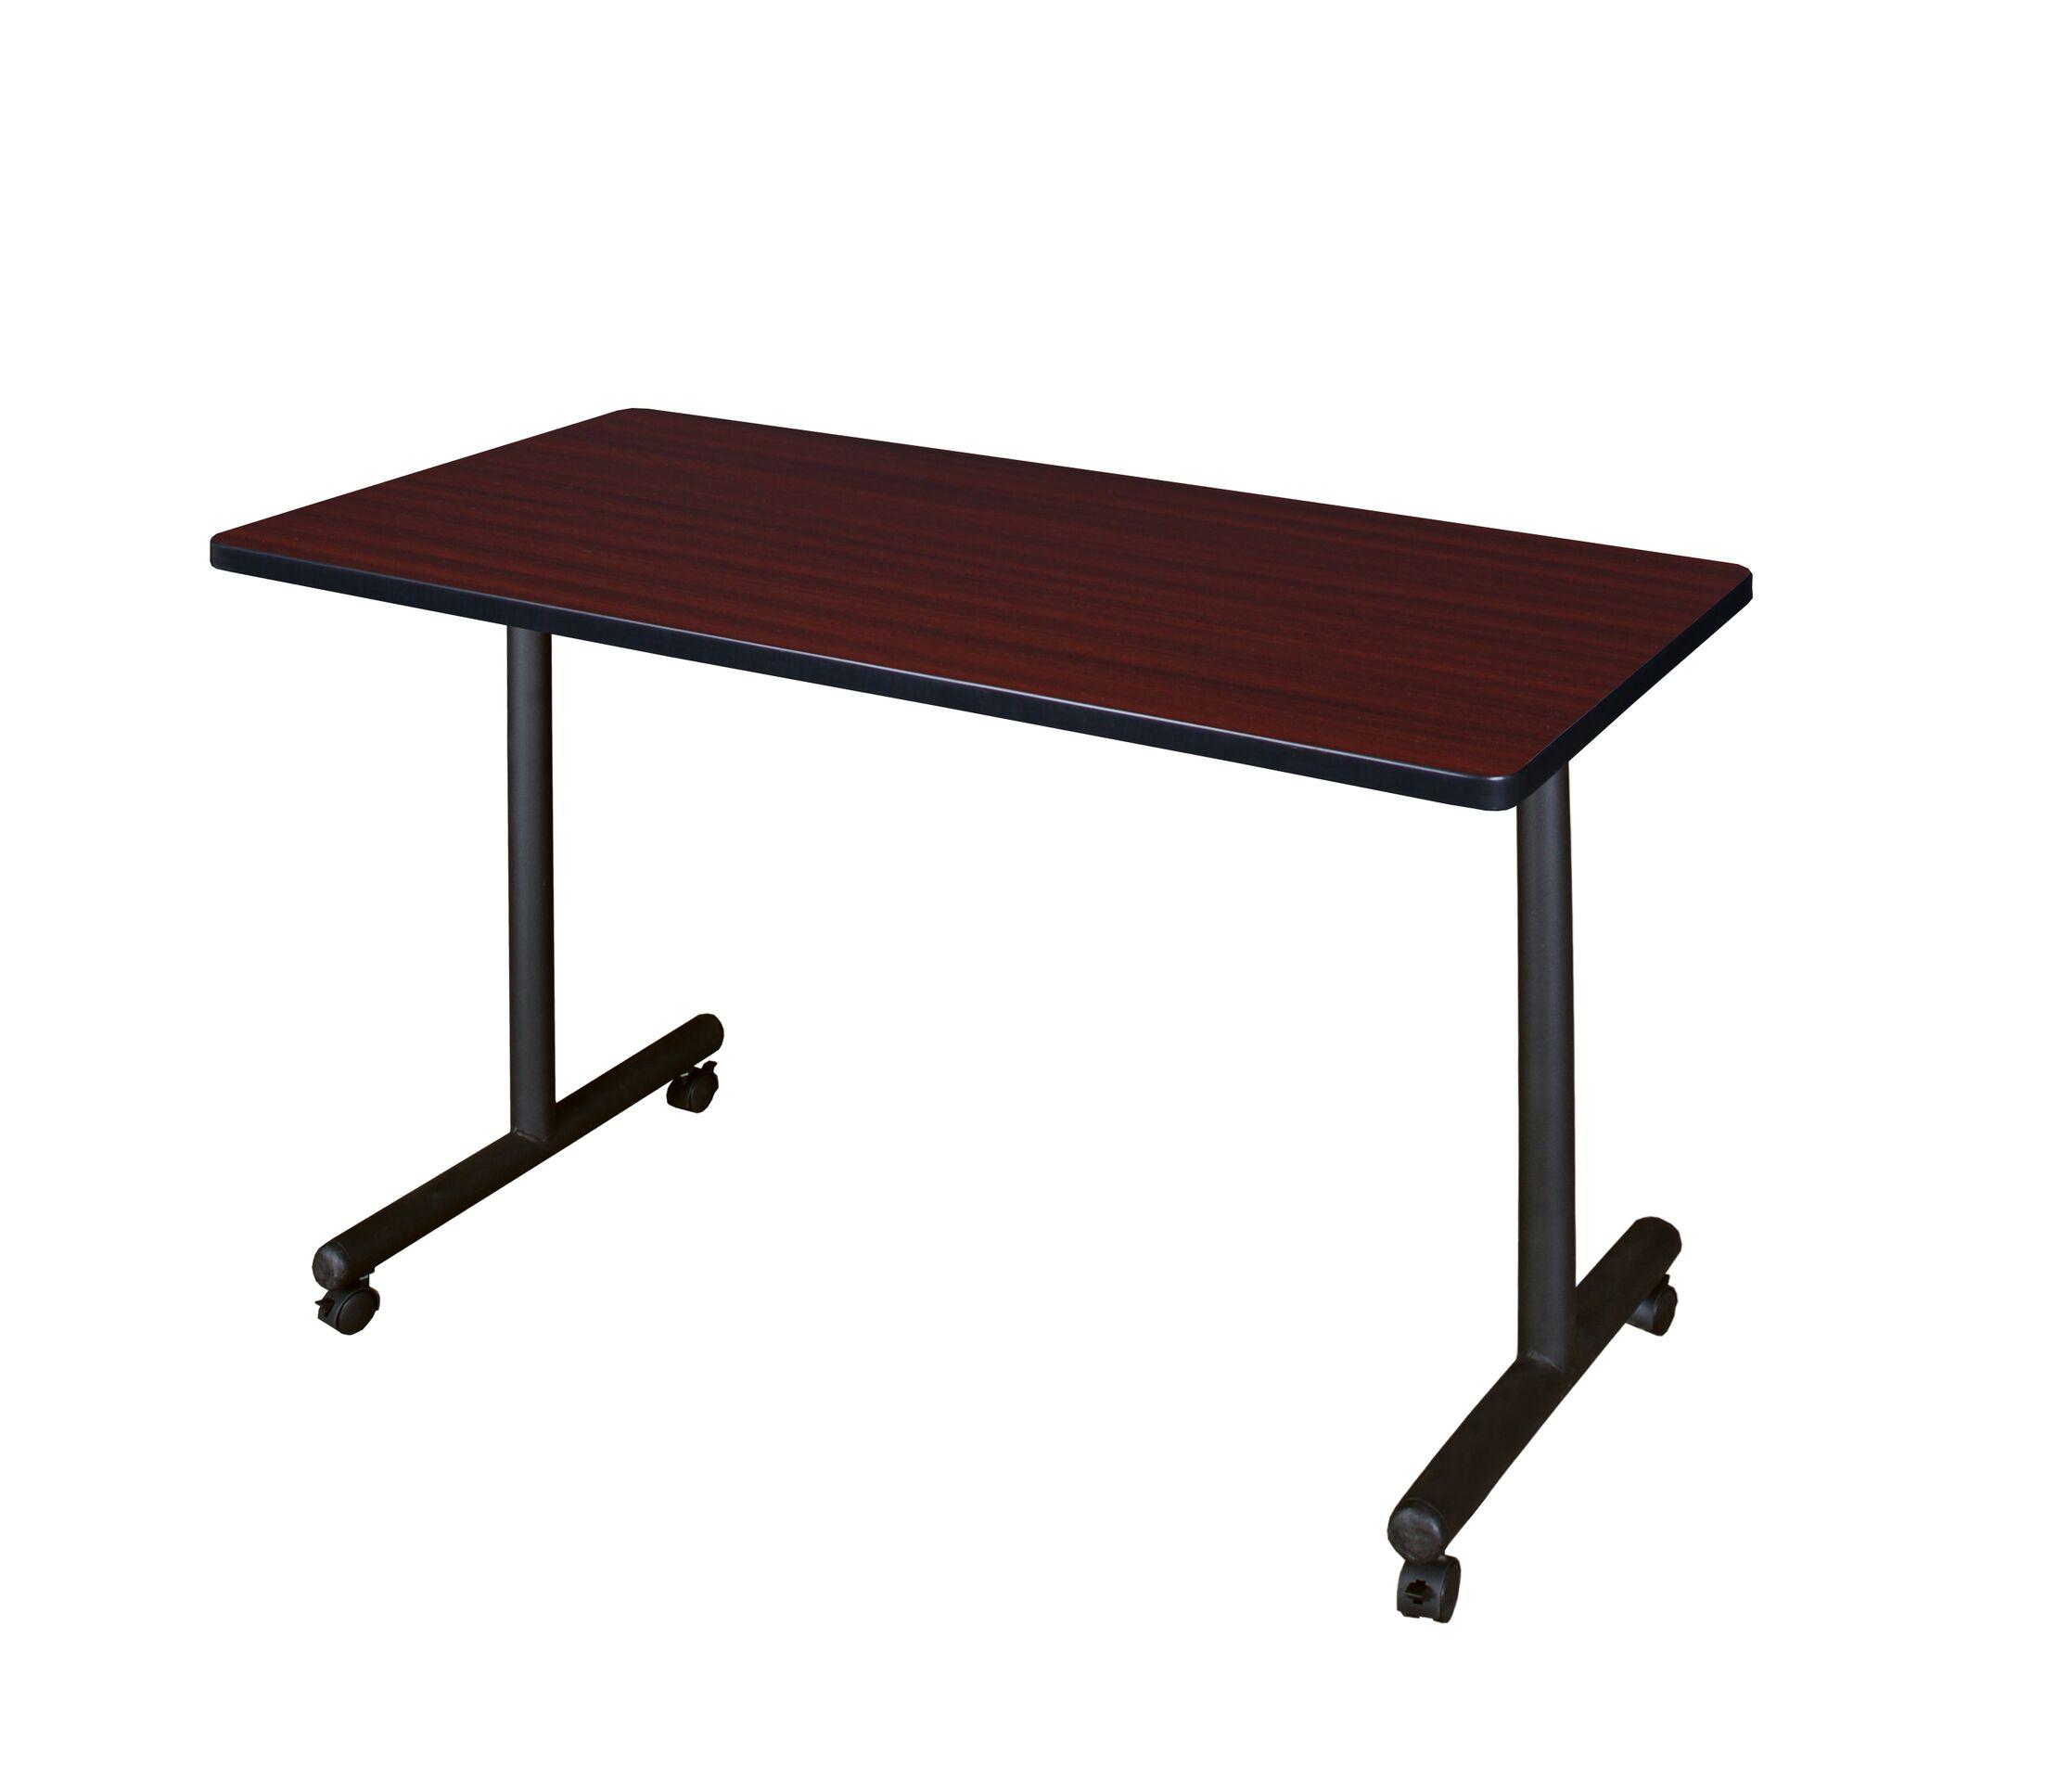 Training Table with Wheels Tabletop Finish: Mahogany, Size: 48